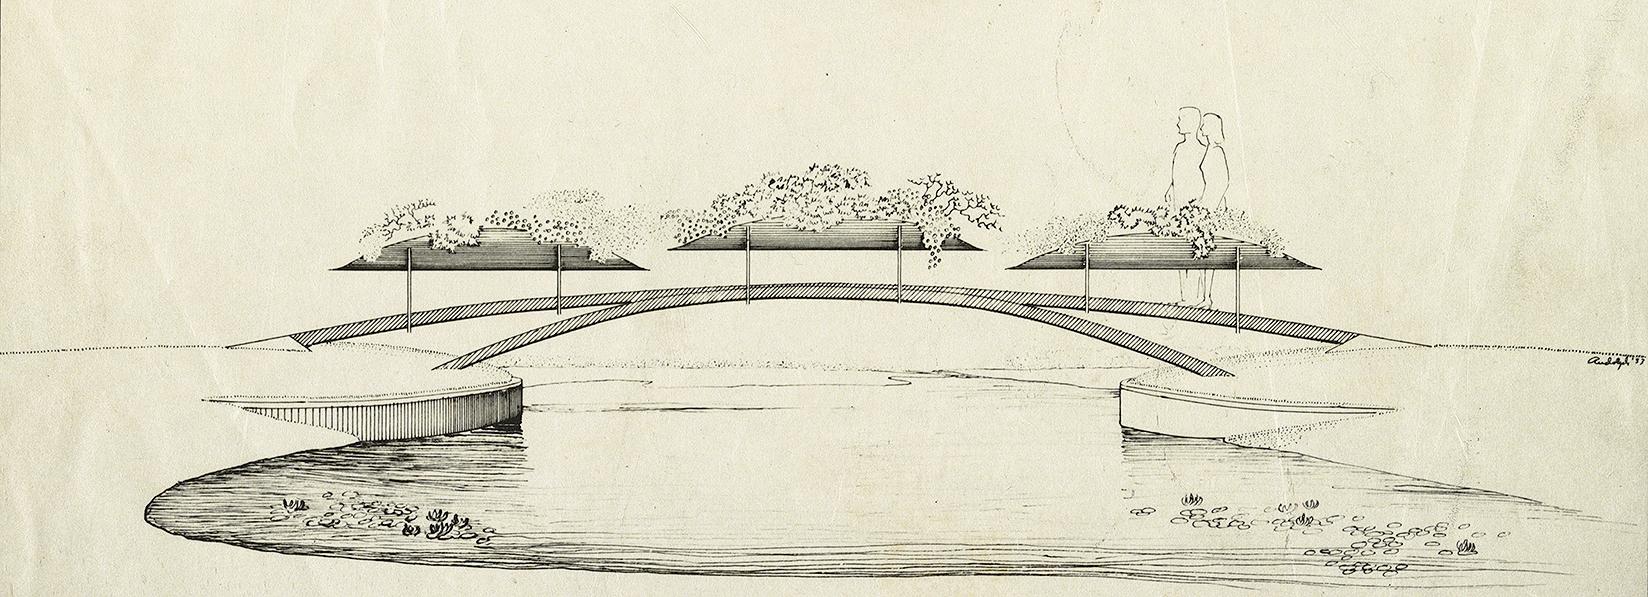 Floating Islands, Leesburg, Florida. Perspective Rendering of Pedestrian Bridge. 1953.